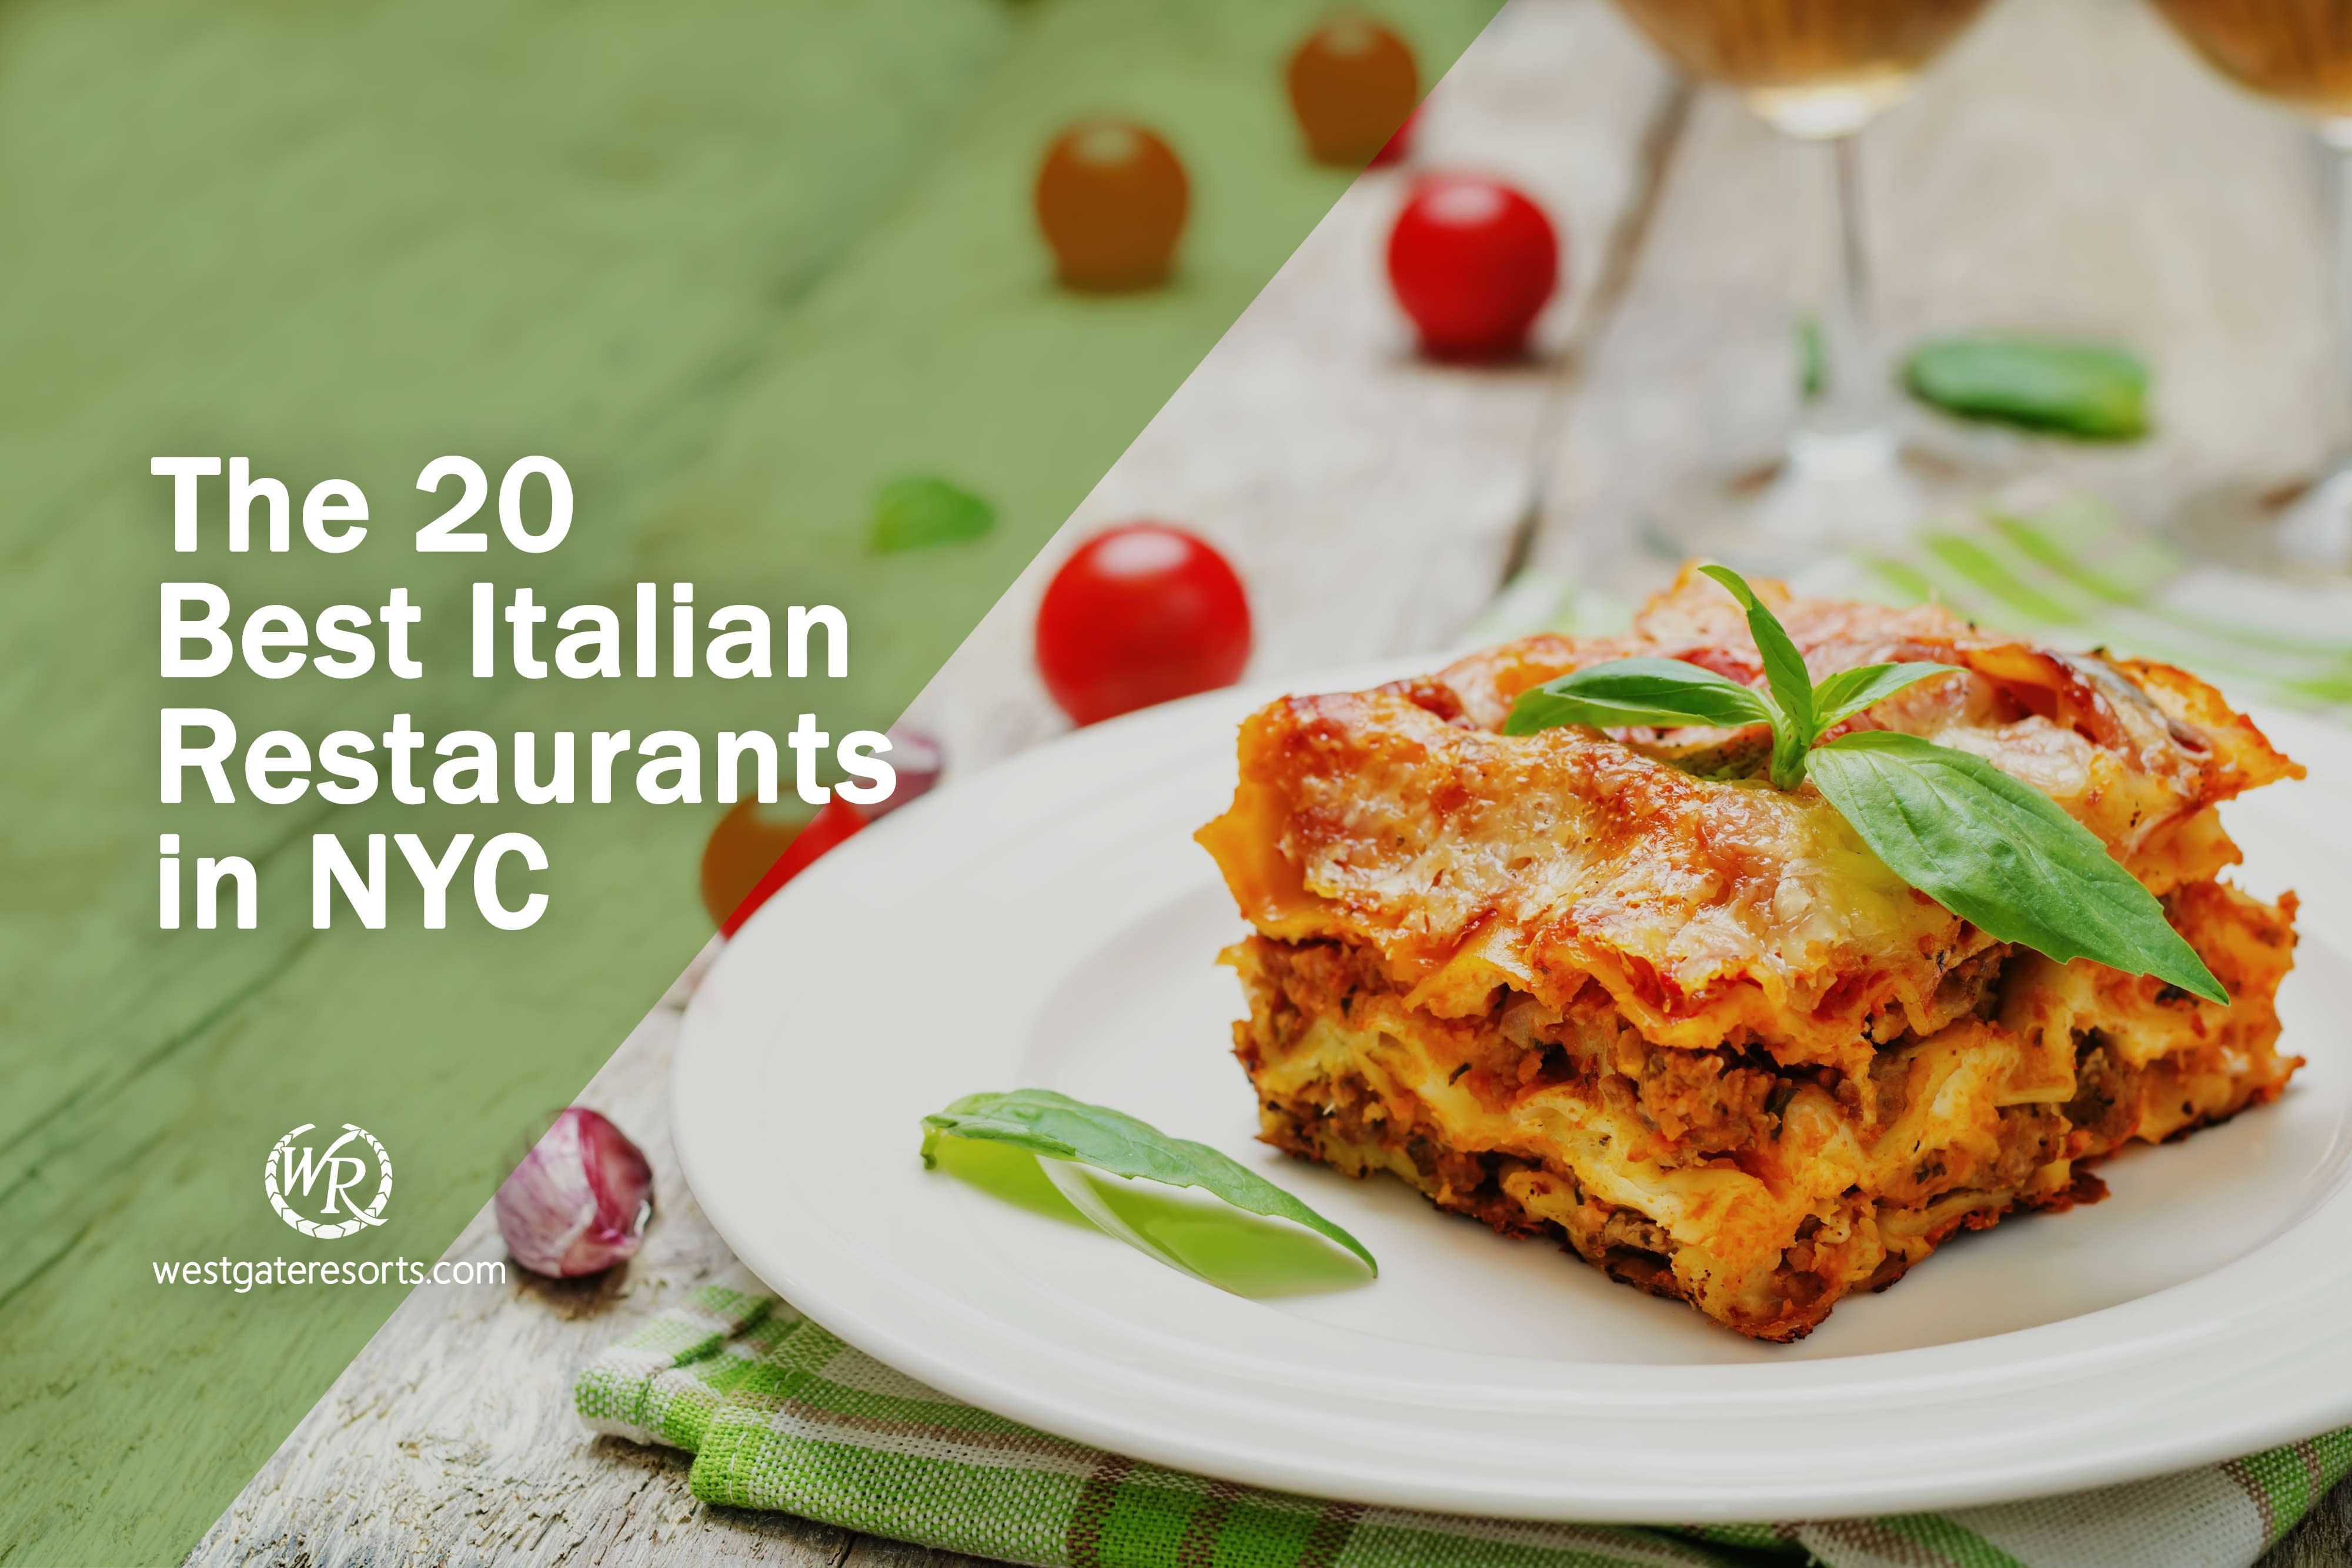 The 20 Best Italian Restaurants in NYC